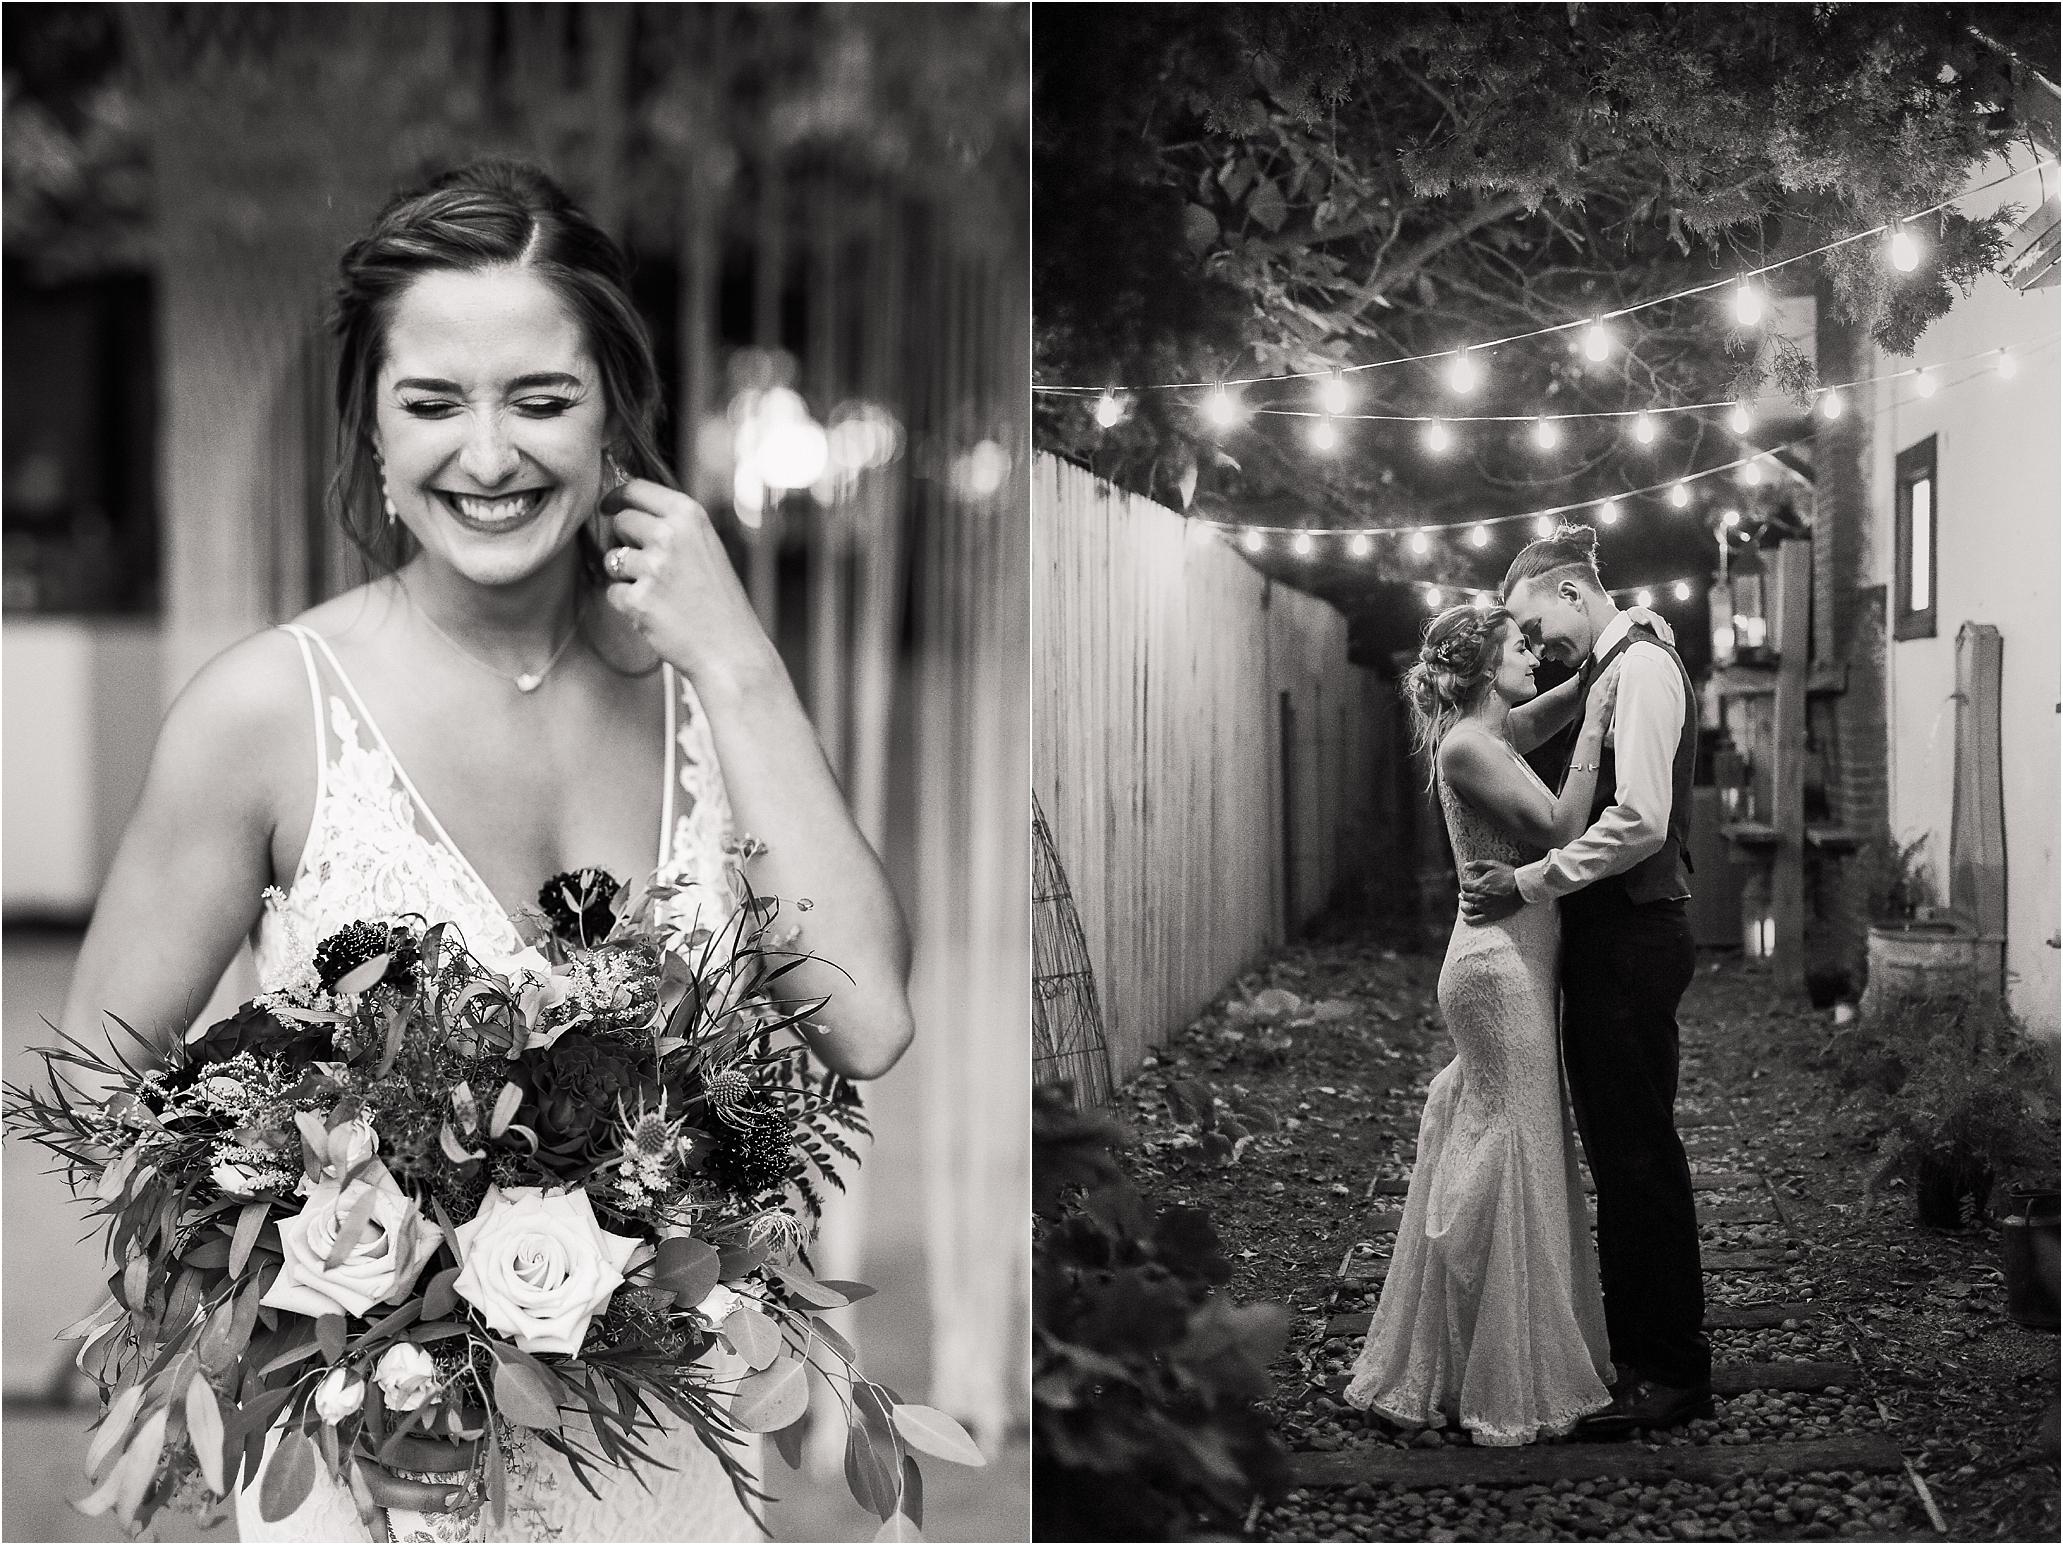 oklahoma wedding photographer bride groom wedding day outside bridal bouquet wedding flowers dancing black&white black white lights string lights